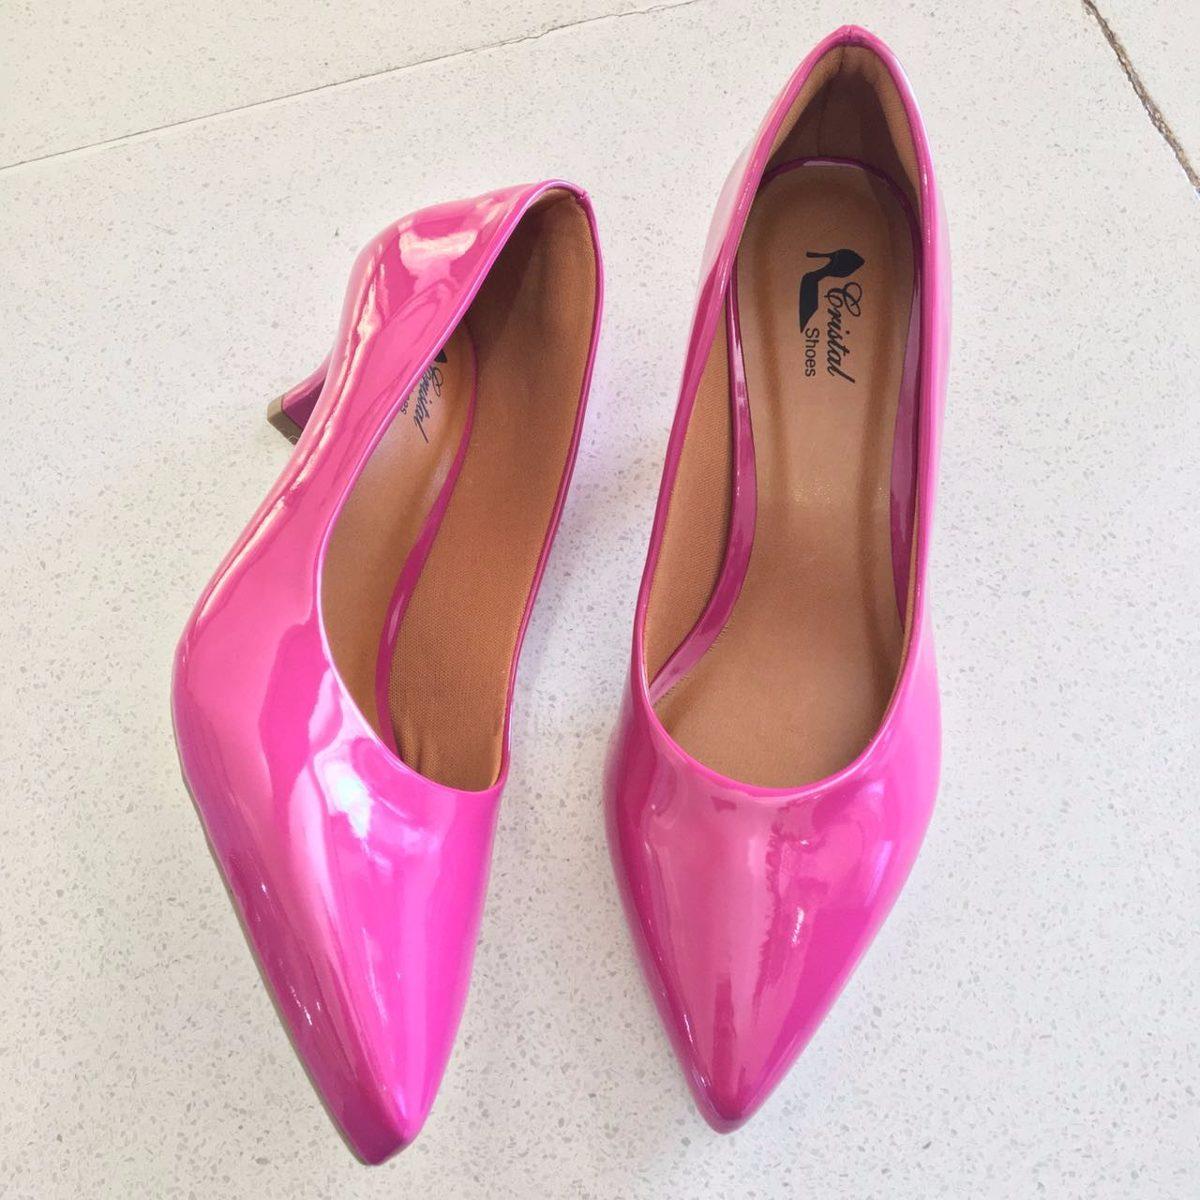 94c1e55726 scarpin rosa pink verniz brilho salto baixo 4 cm bico fino. Carregando zoom.